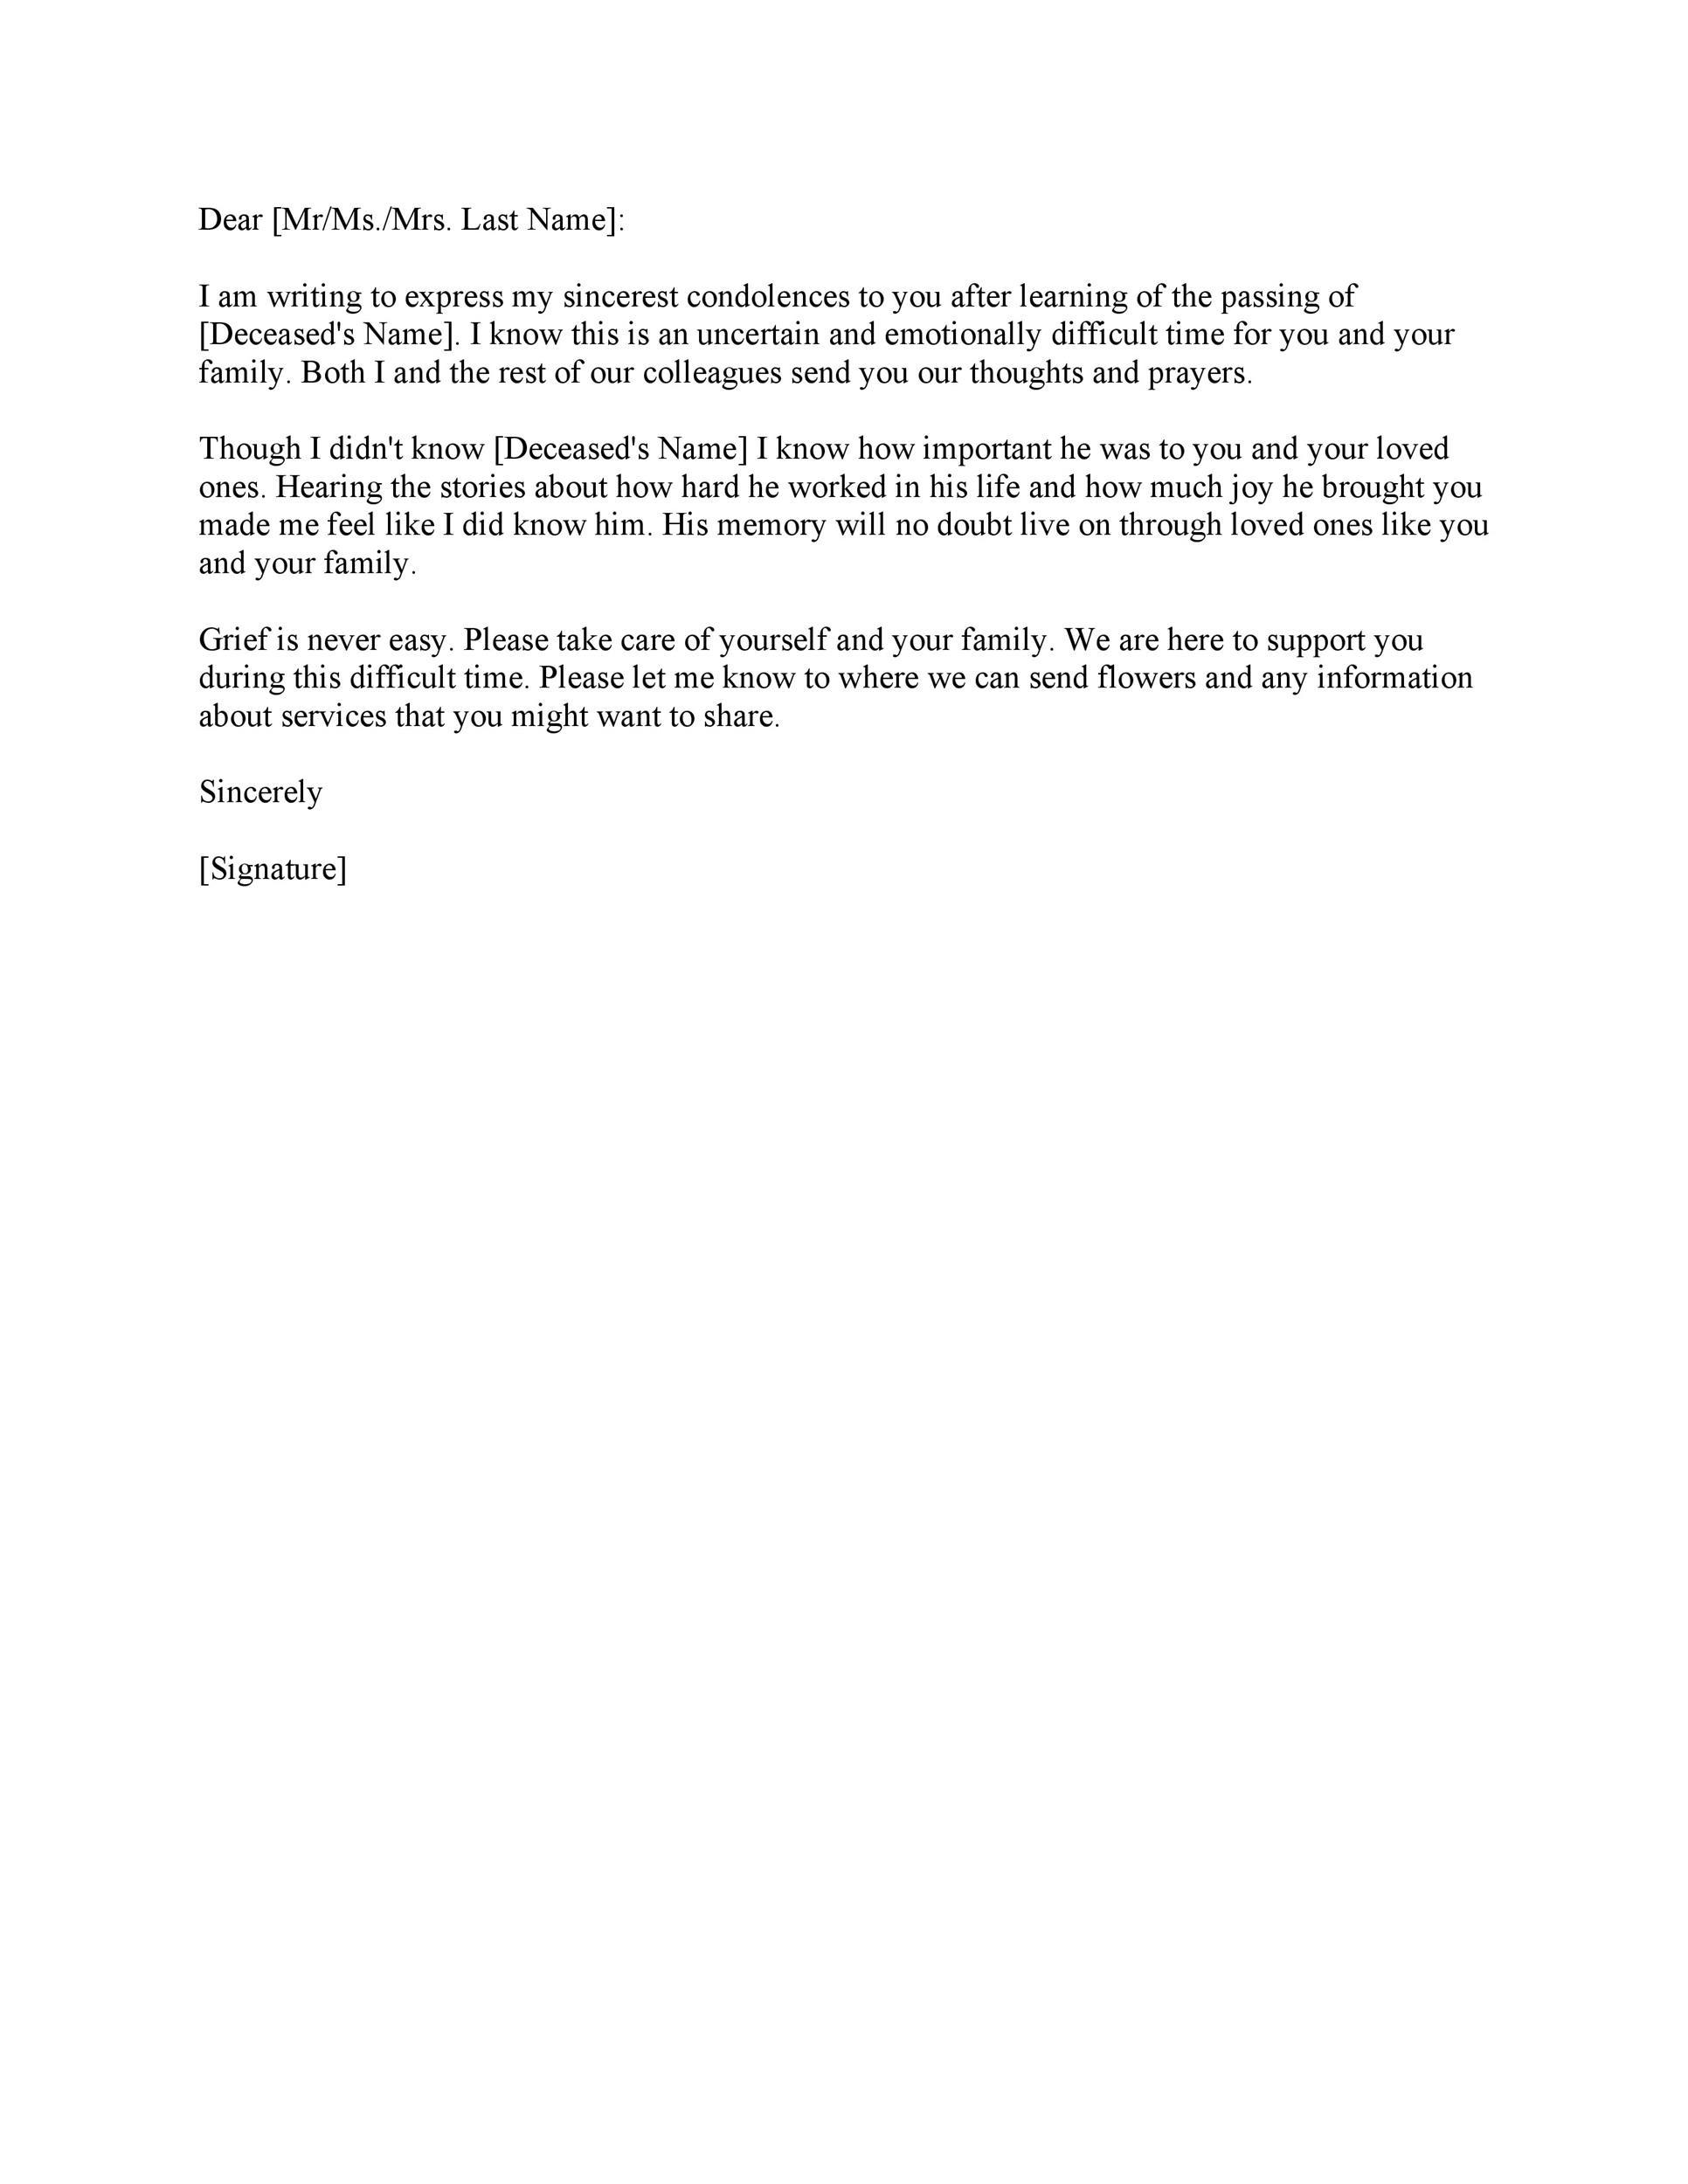 Condolence Letter Sample For Colleague